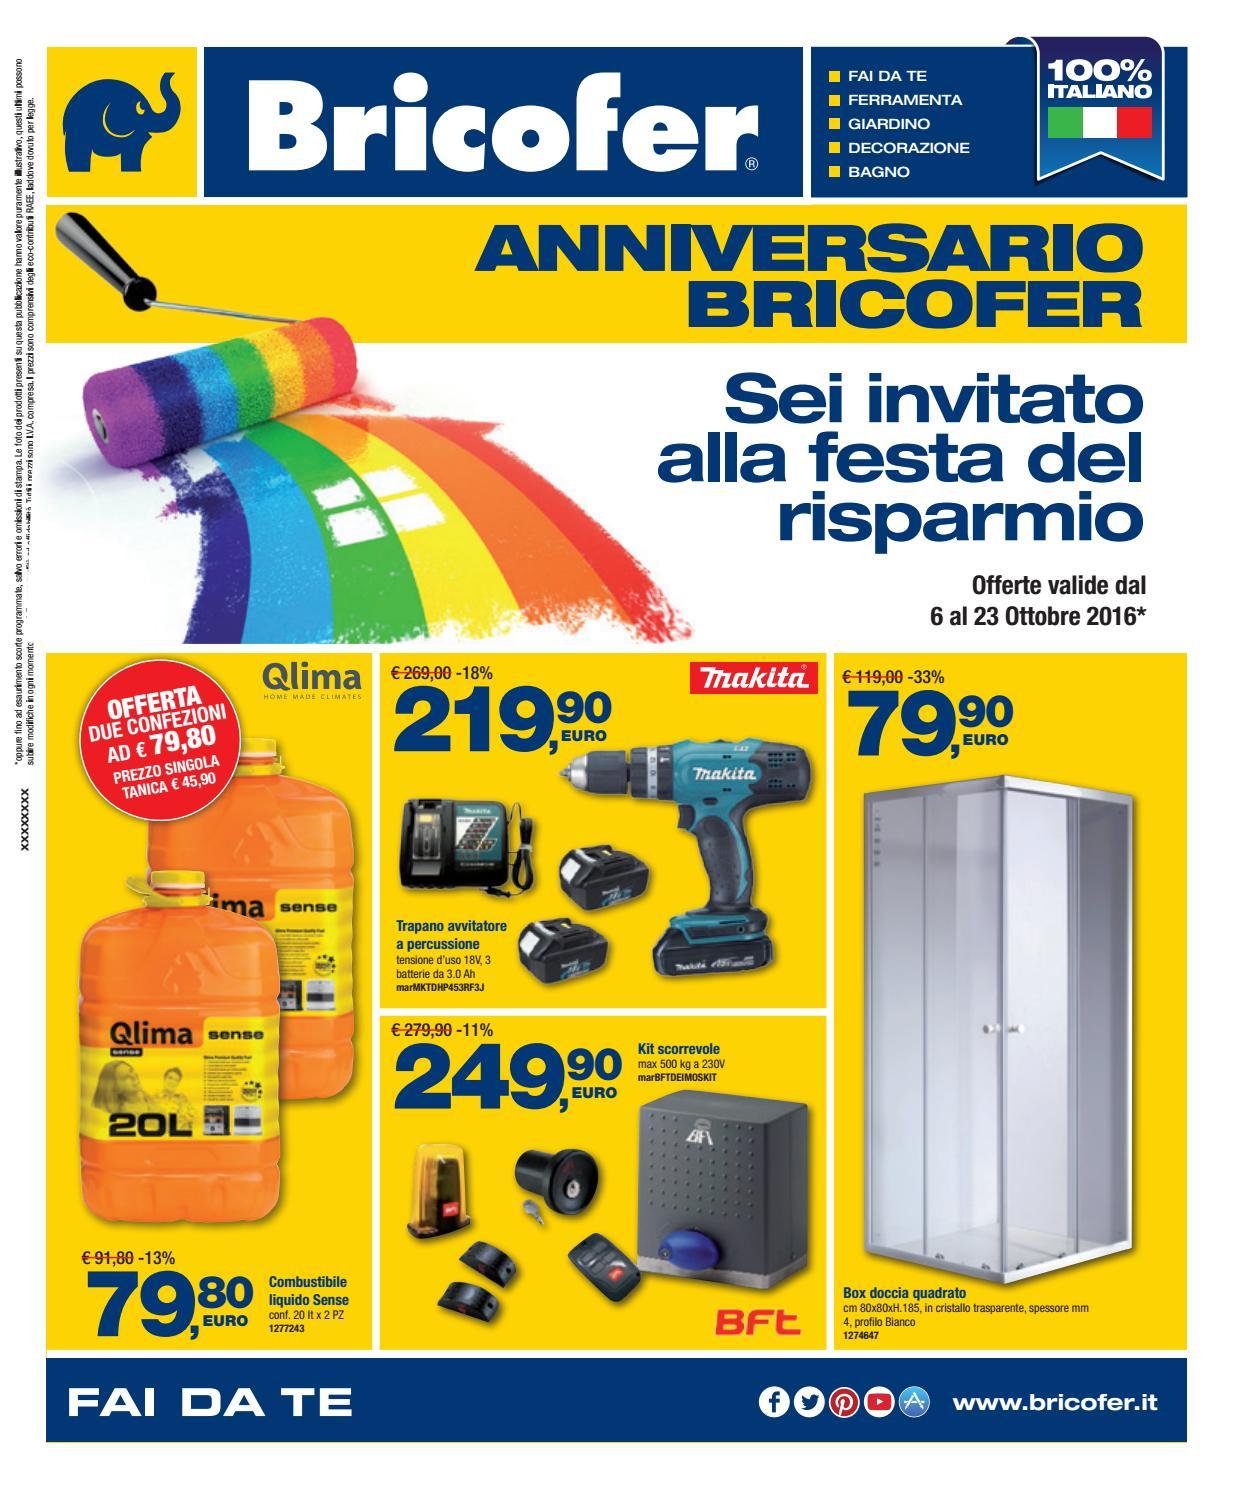 Cabina Doccia Bricofer.Volantino Bricofer Aversa Ottobre 2016 By Bricofer Aversa